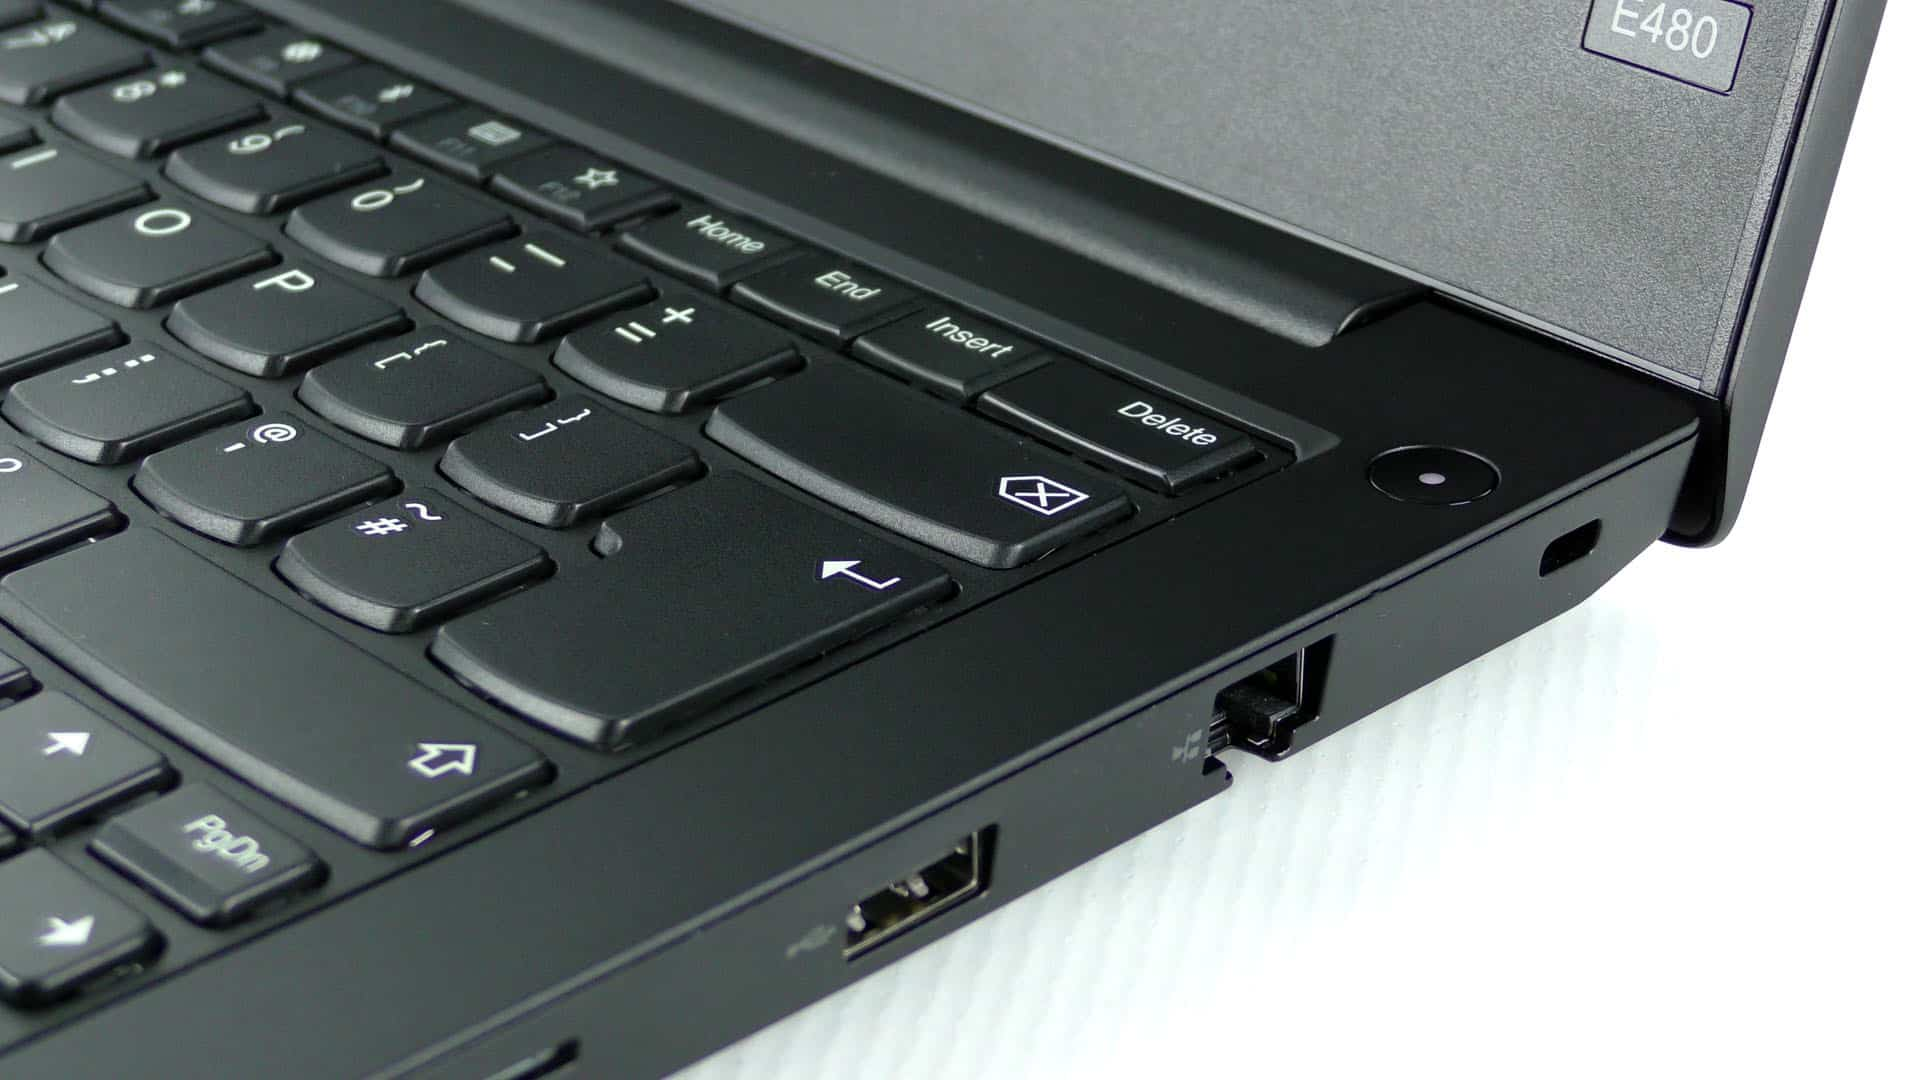 Lenovo ThinkPad E480 - prawa strona pulpitu